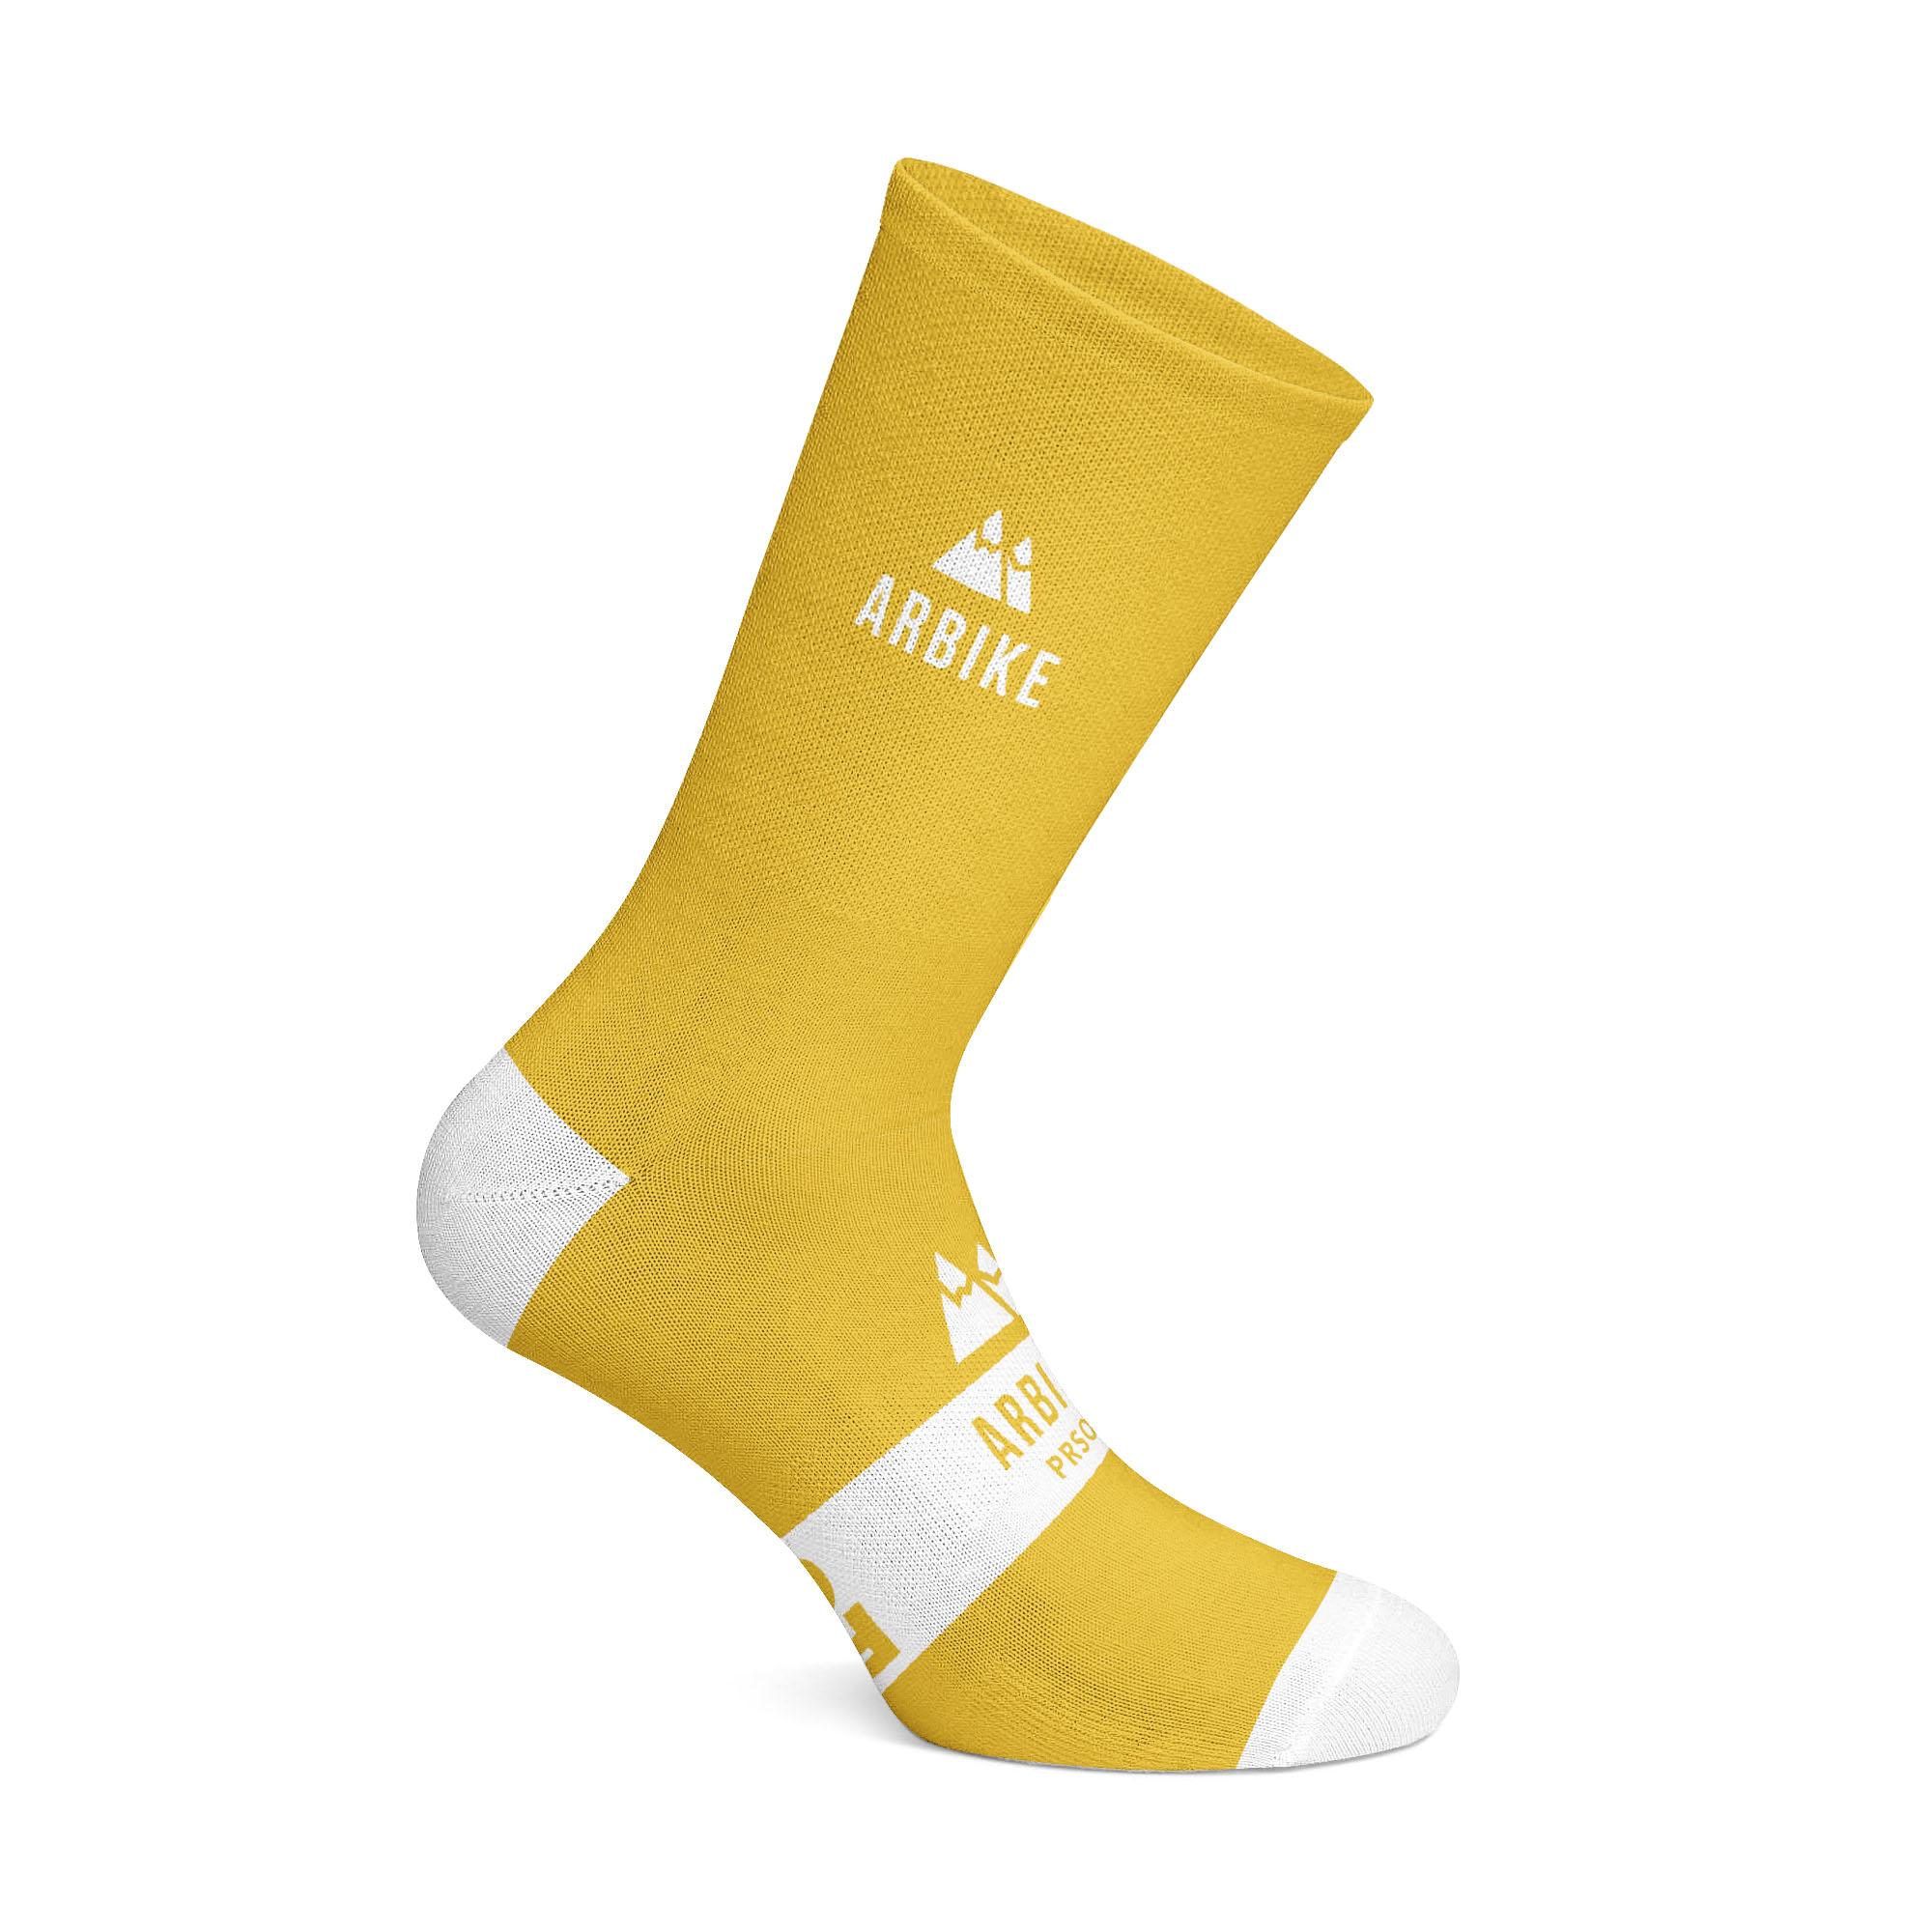 ARBike PRSOCKS calcetines de ciclismo